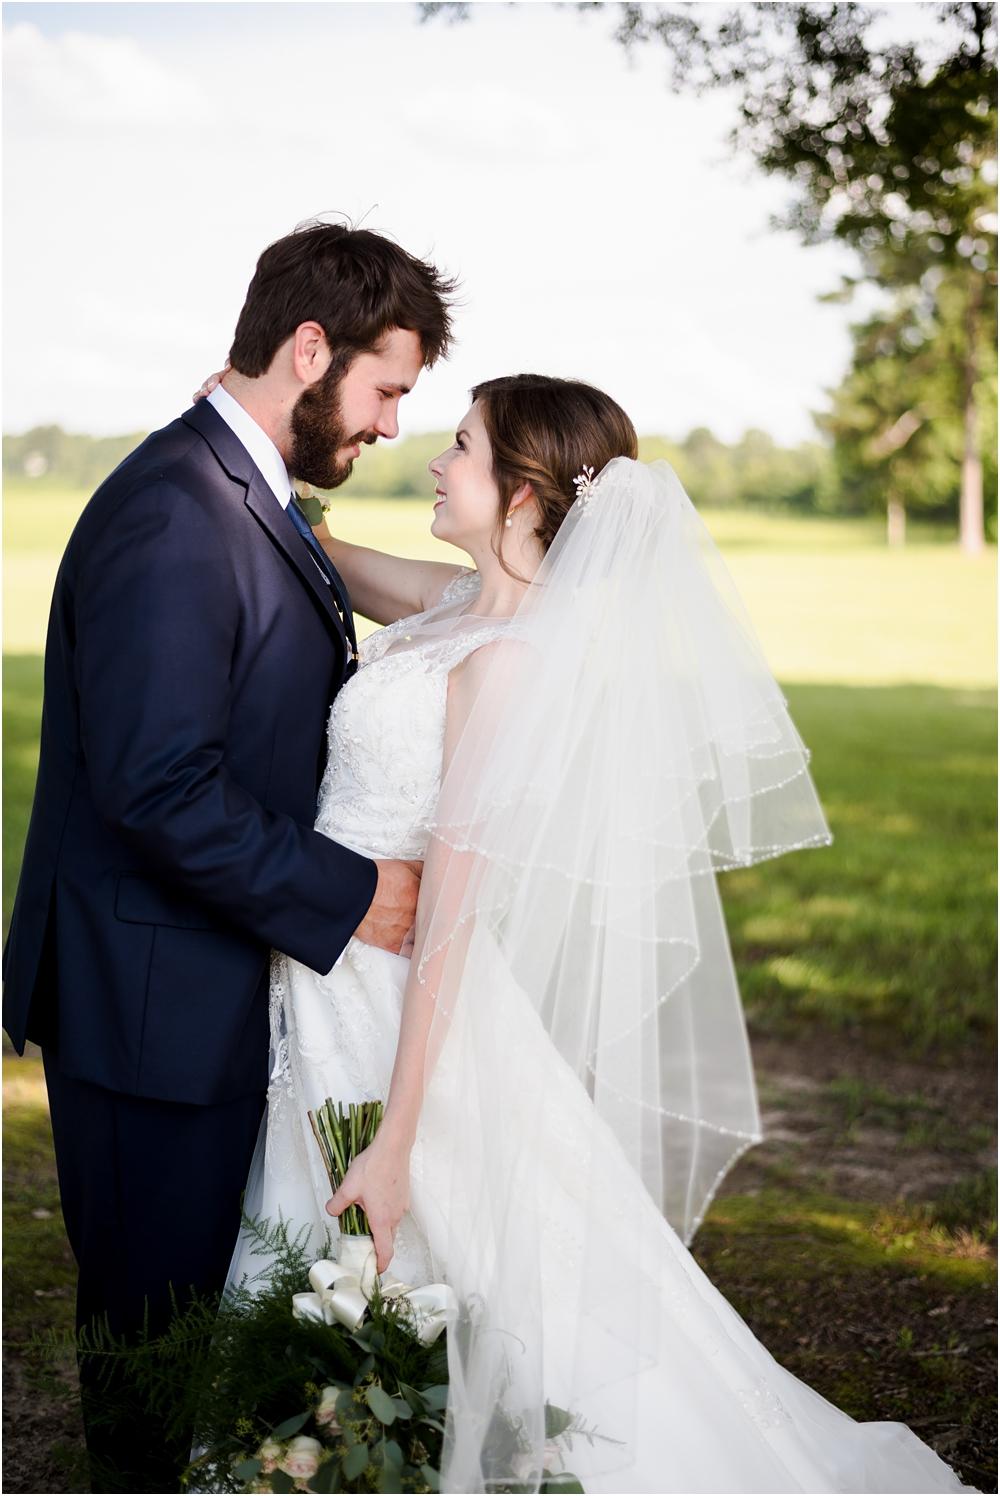 marianna-florida-wedding-photographer-kiersten-grant-62.jpg